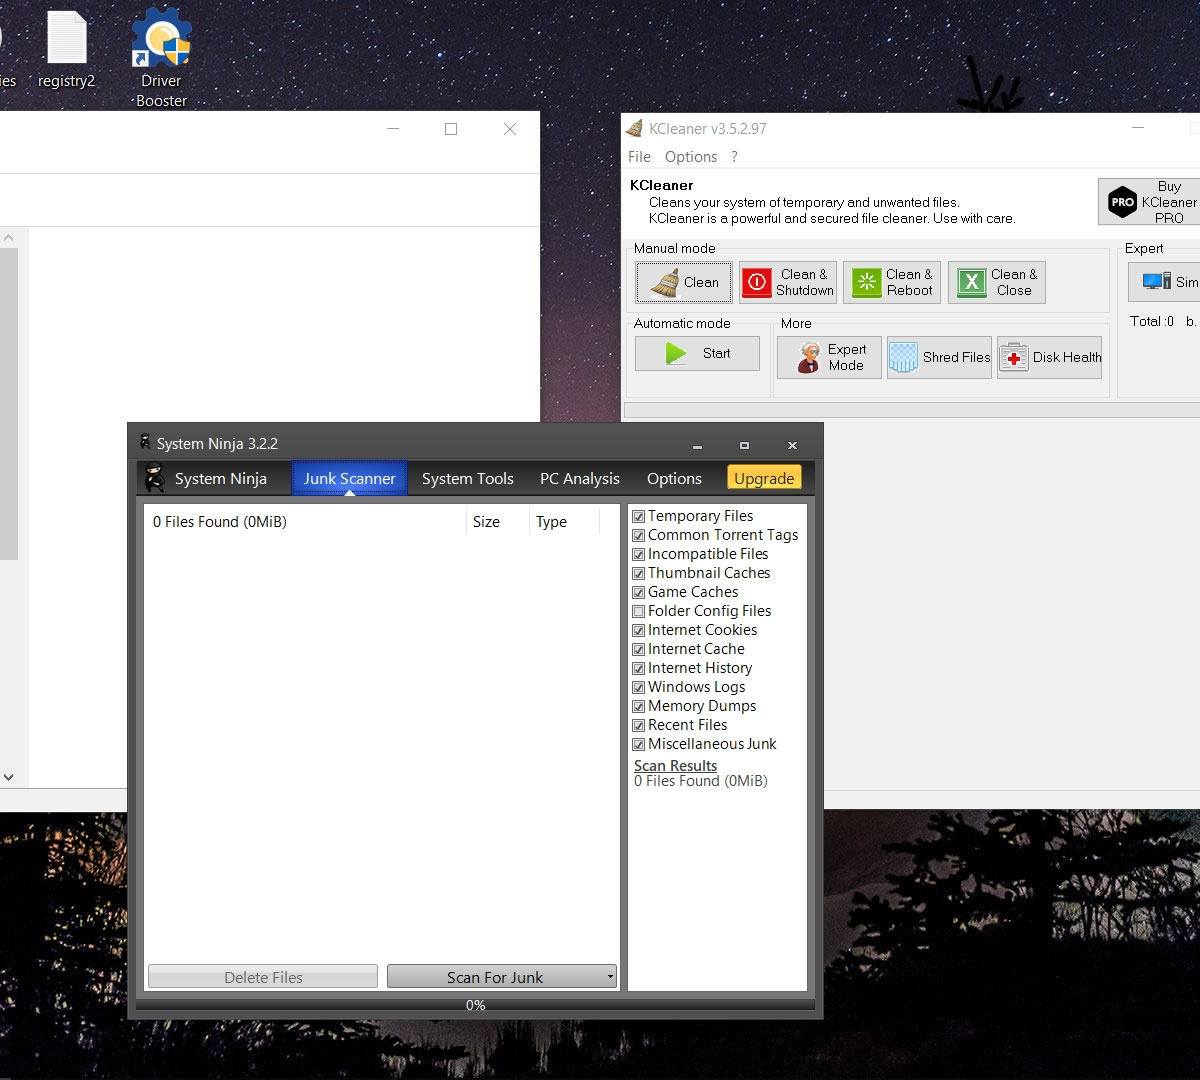 CCleaner_programma_1_20123116-1200x1080.jpg